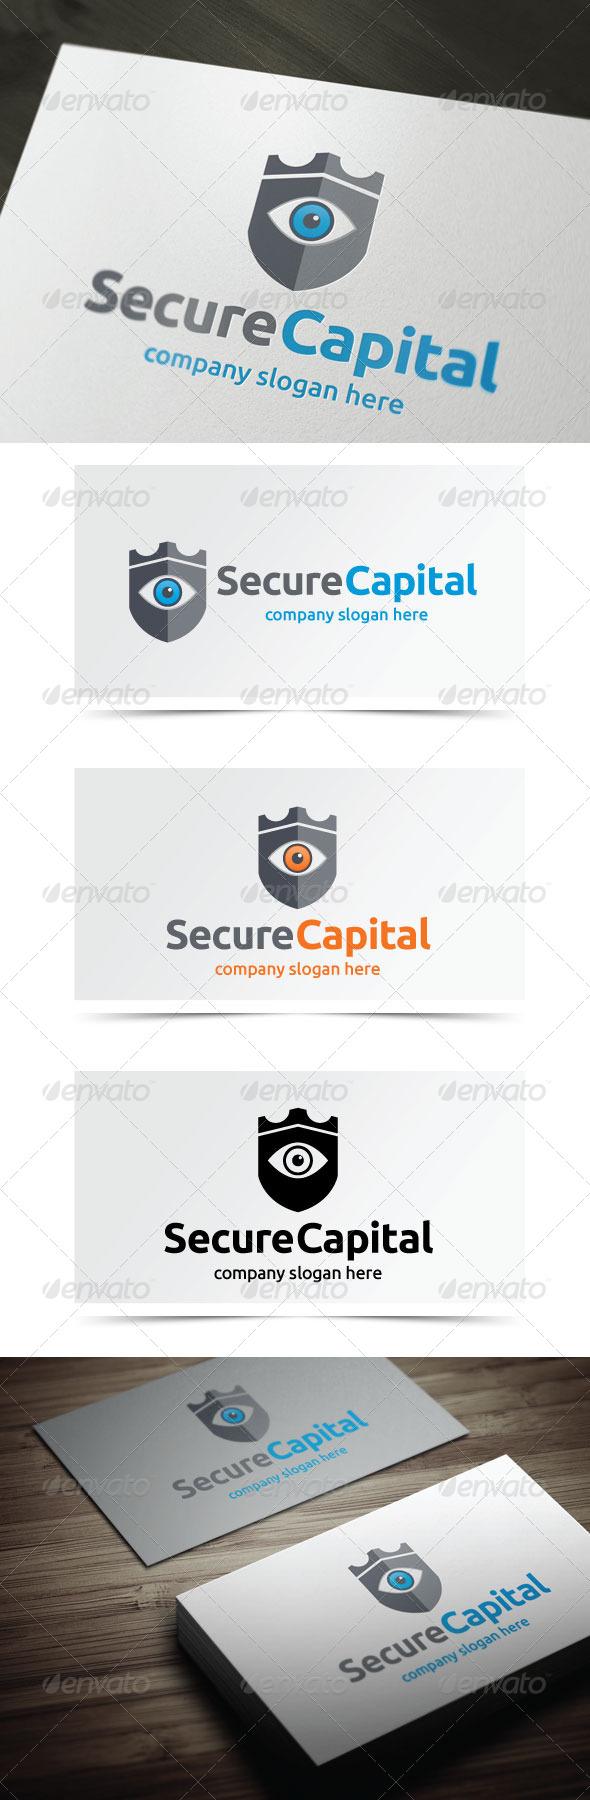 Secure Capital